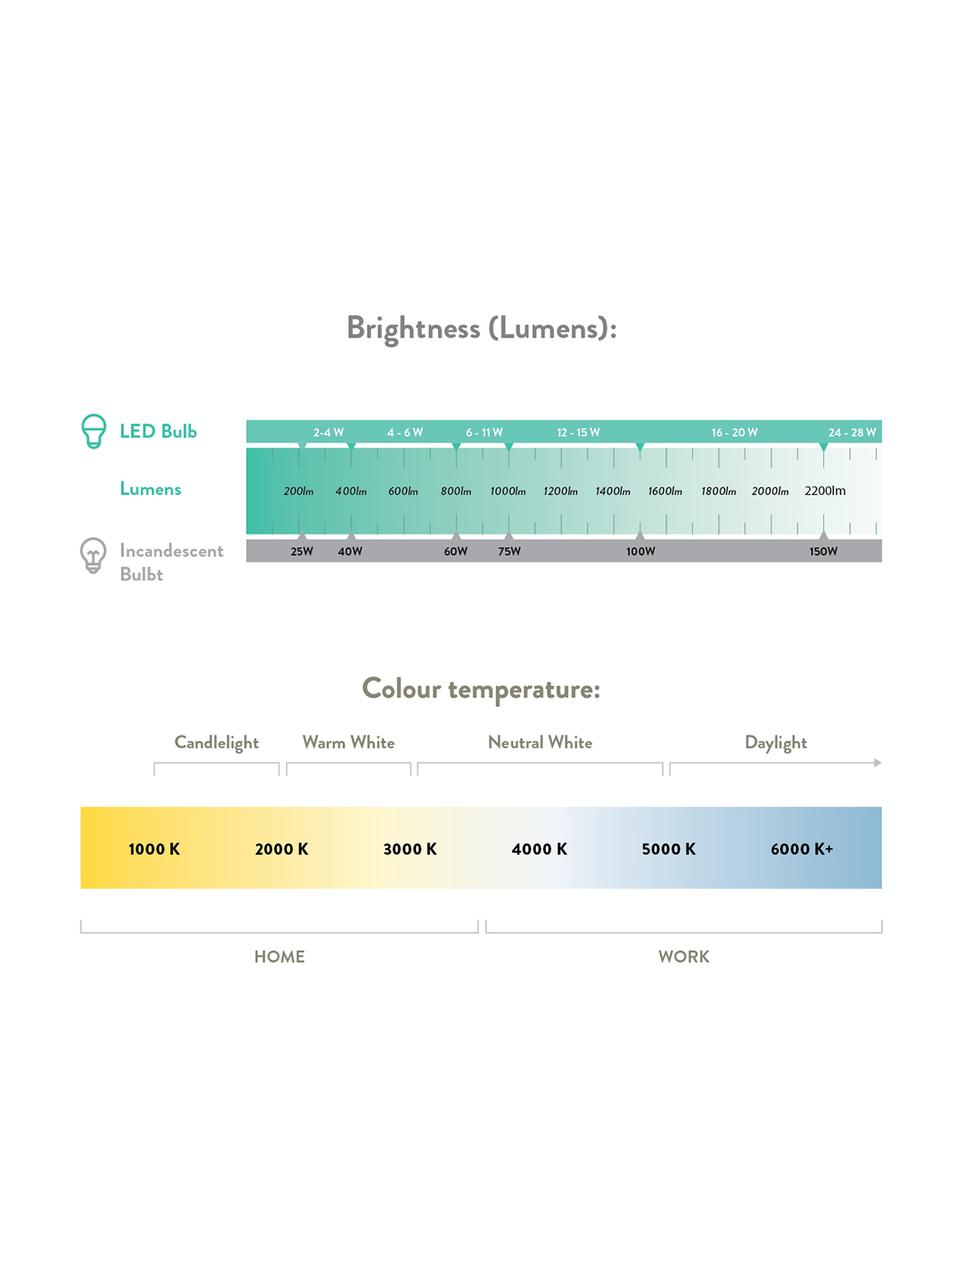 E27 Leuchtmittel, 4.6W, warmweiß, 1 Stück, Leuchtmittelschirm: Opalglas, Leuchtmittelfassung: Aluminium, Weiß, Ø 6 x H 10 cm